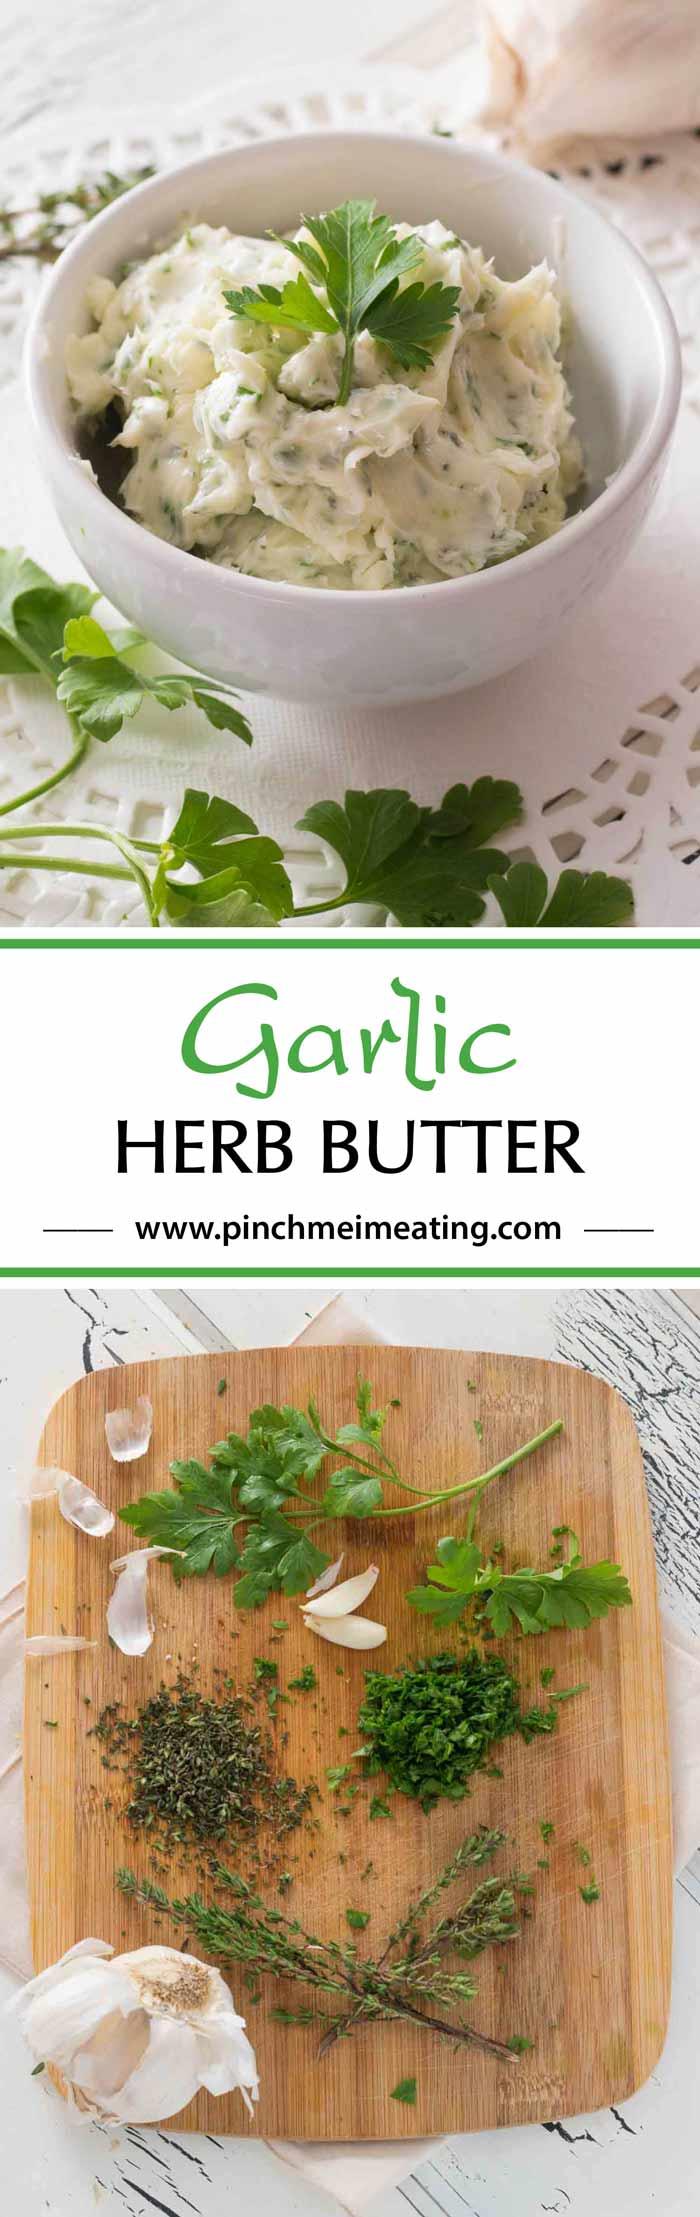 Garlic-herb-butter